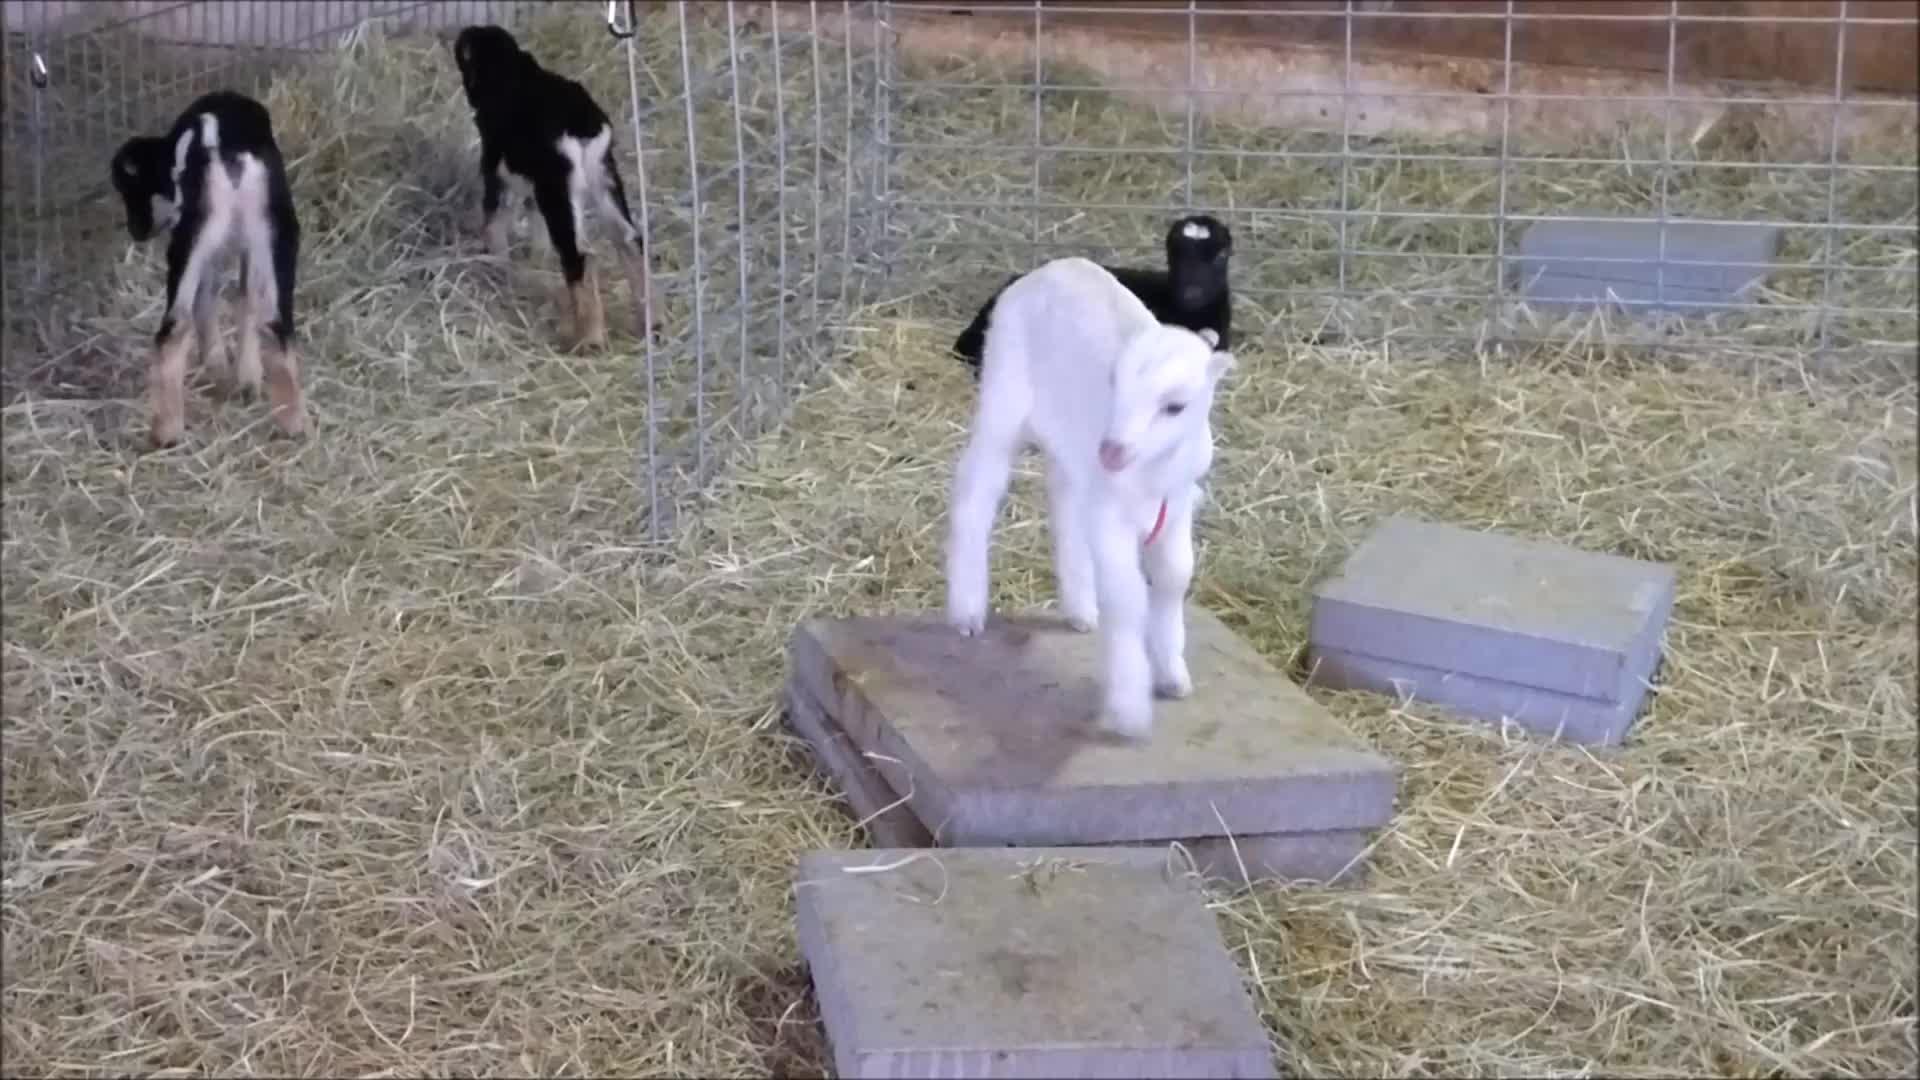 animal, animals, eyebleach, goat, goats, knsfarm, parkour, tippytaps, Big Hop & Tippy Taps GIFs